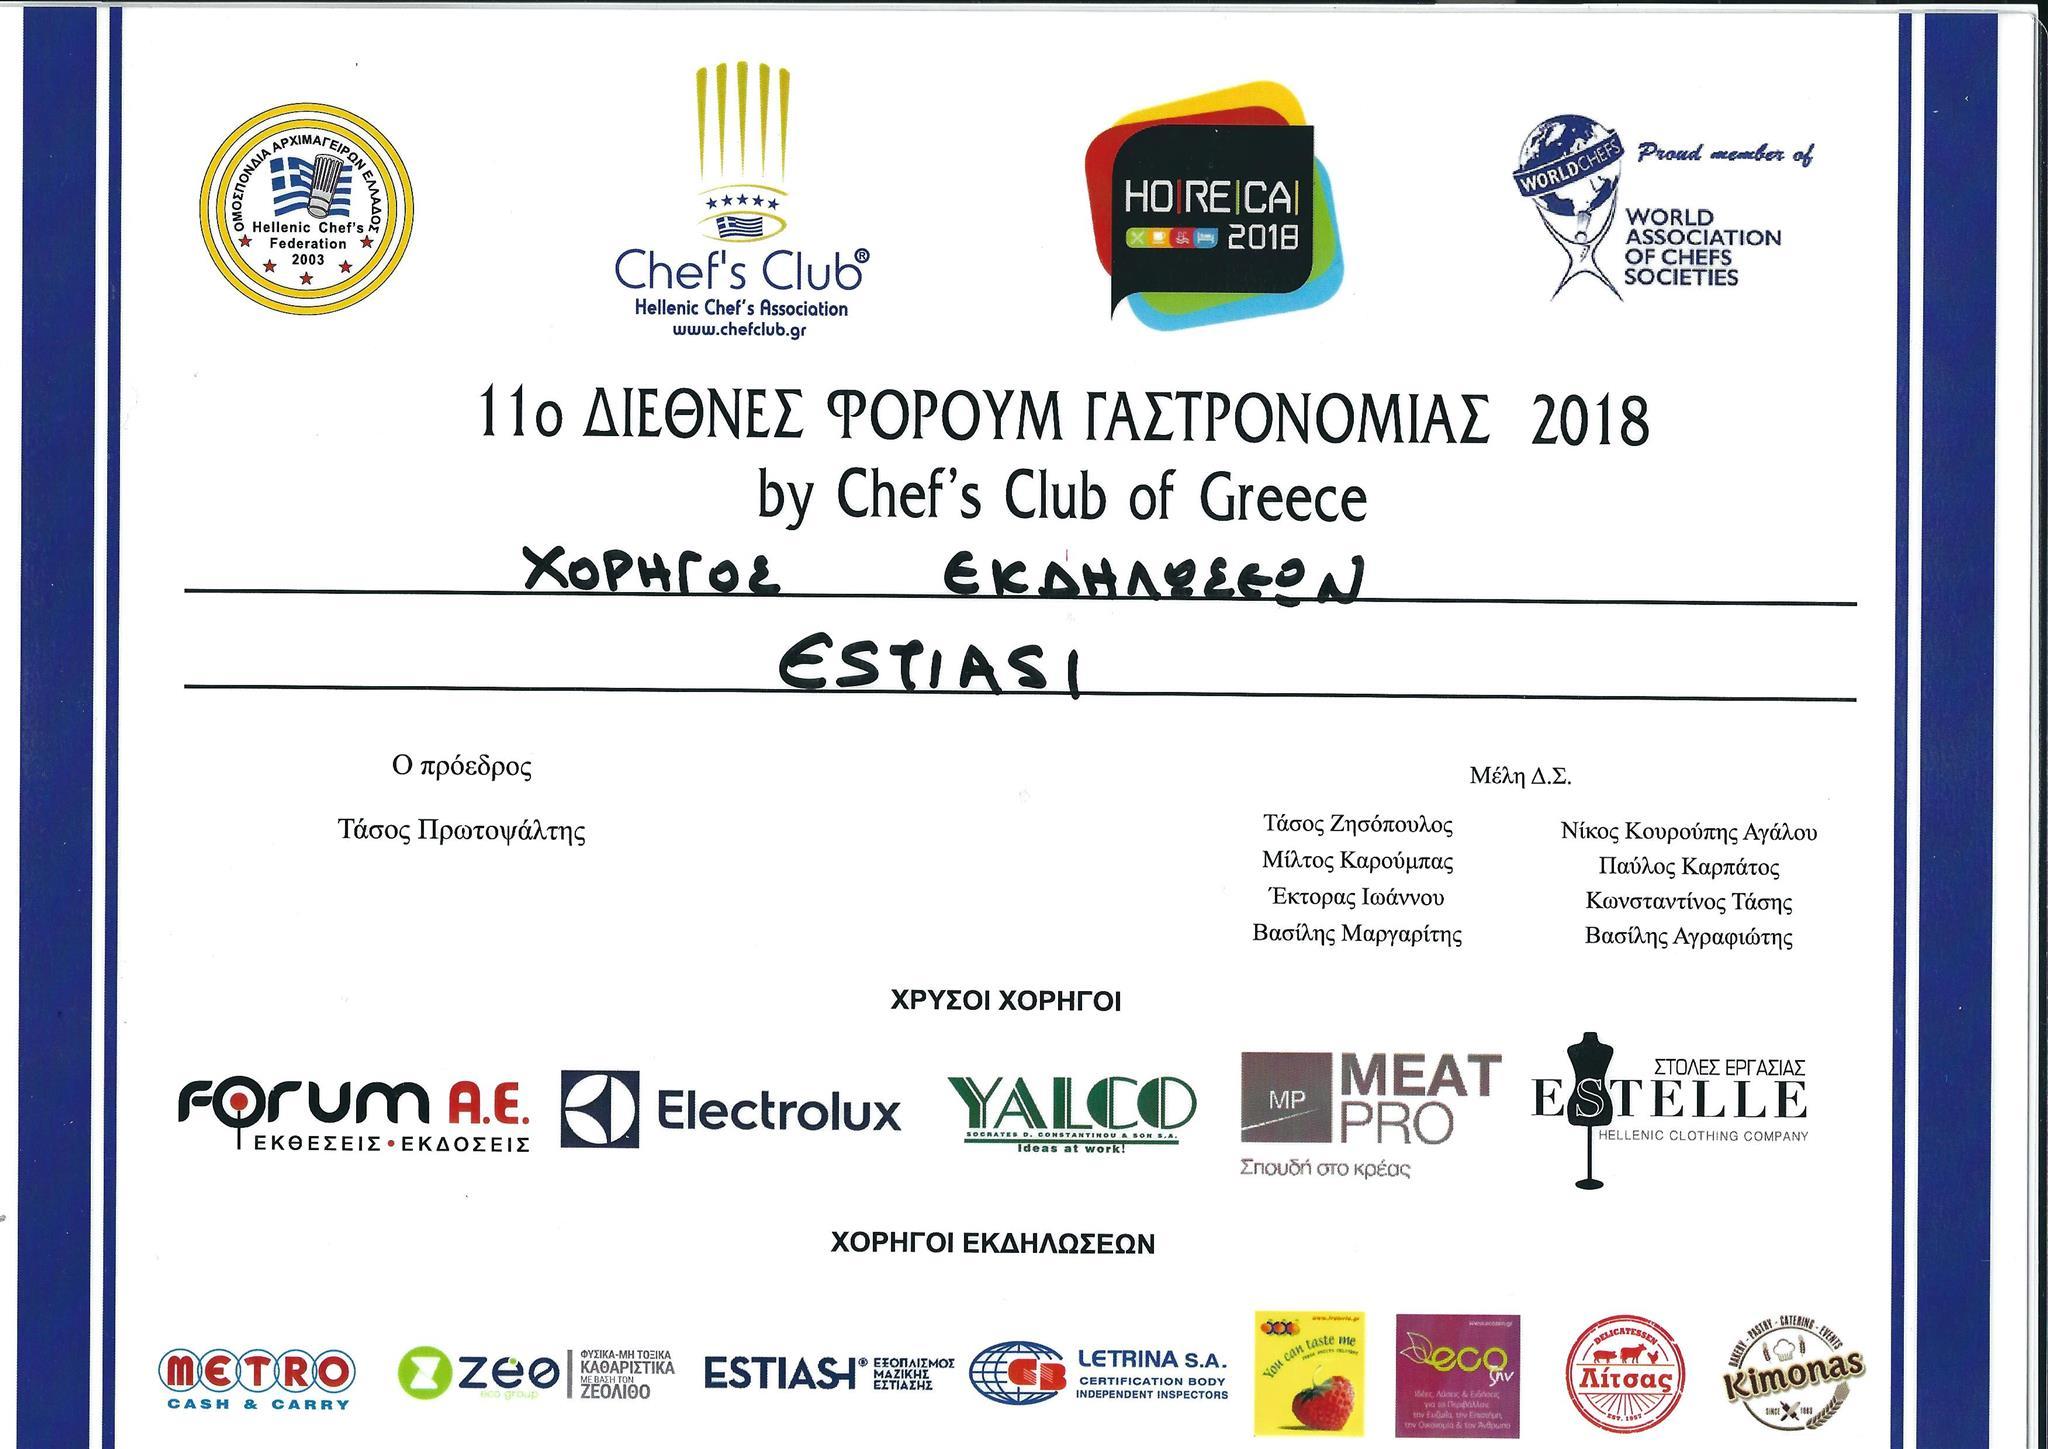 Gastronomy Forum 2018 diploma